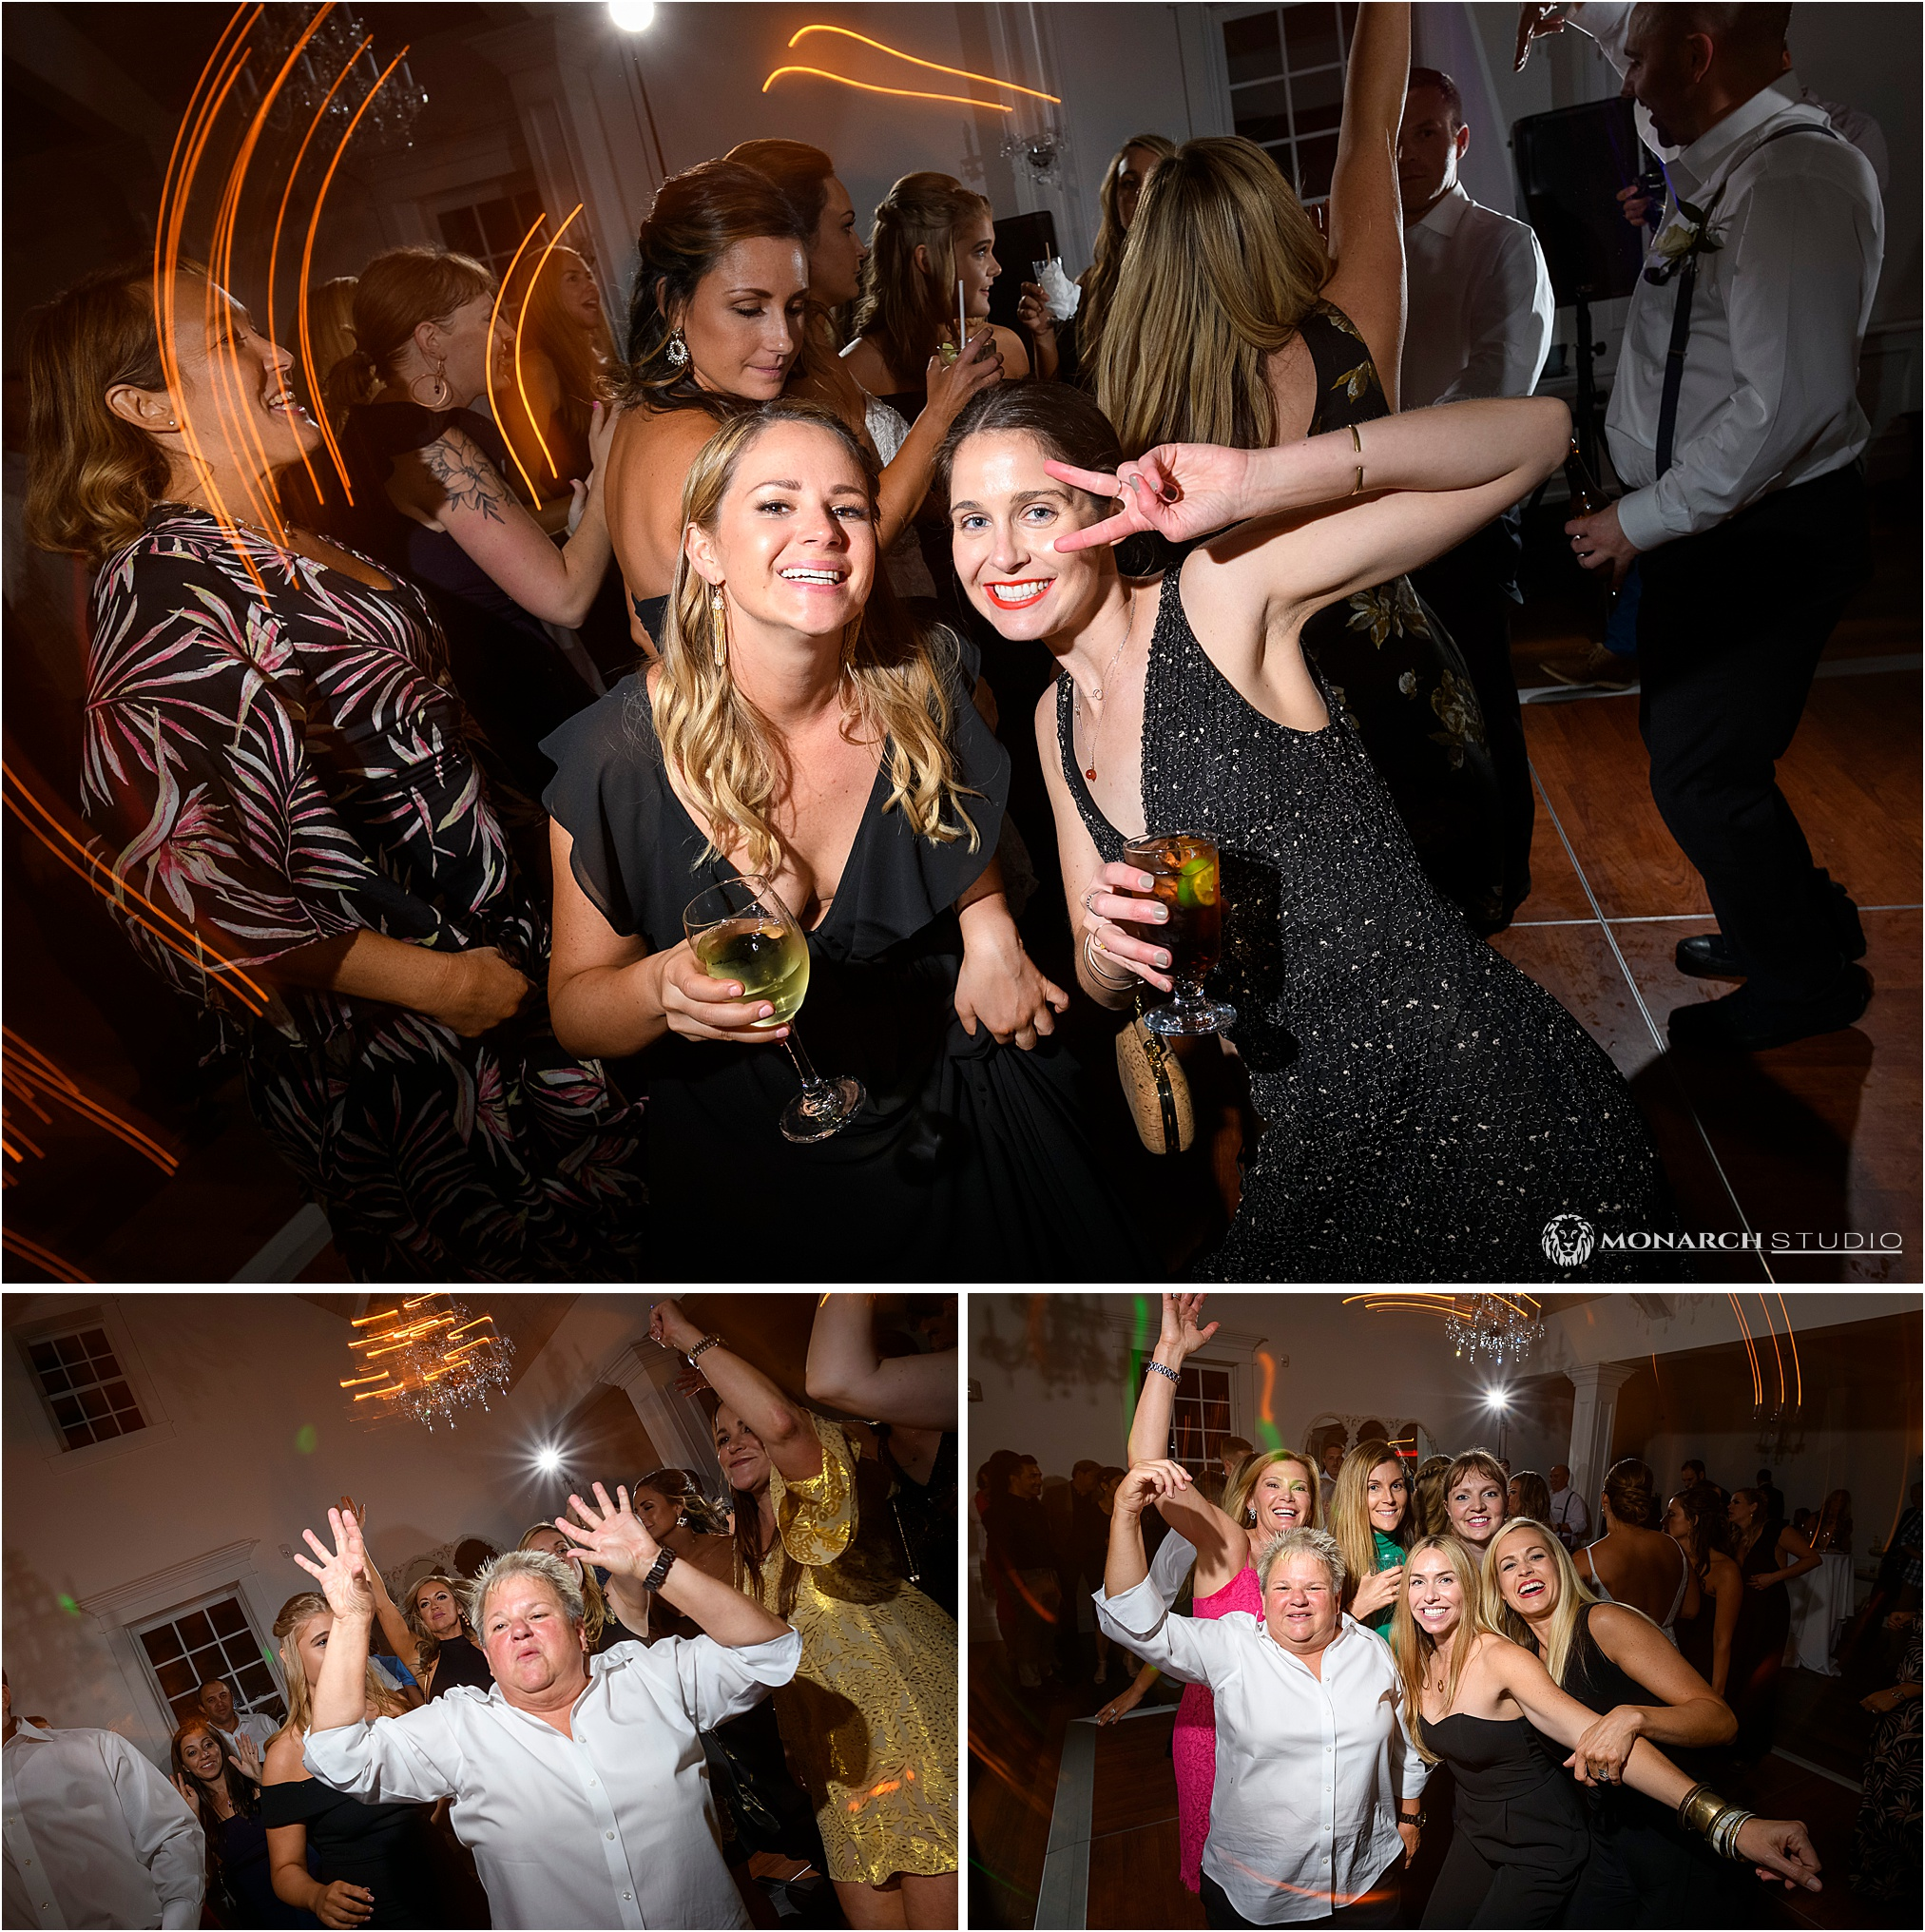 115-whiteroom-wedding-photographer-2019-05-22_0097.jpg